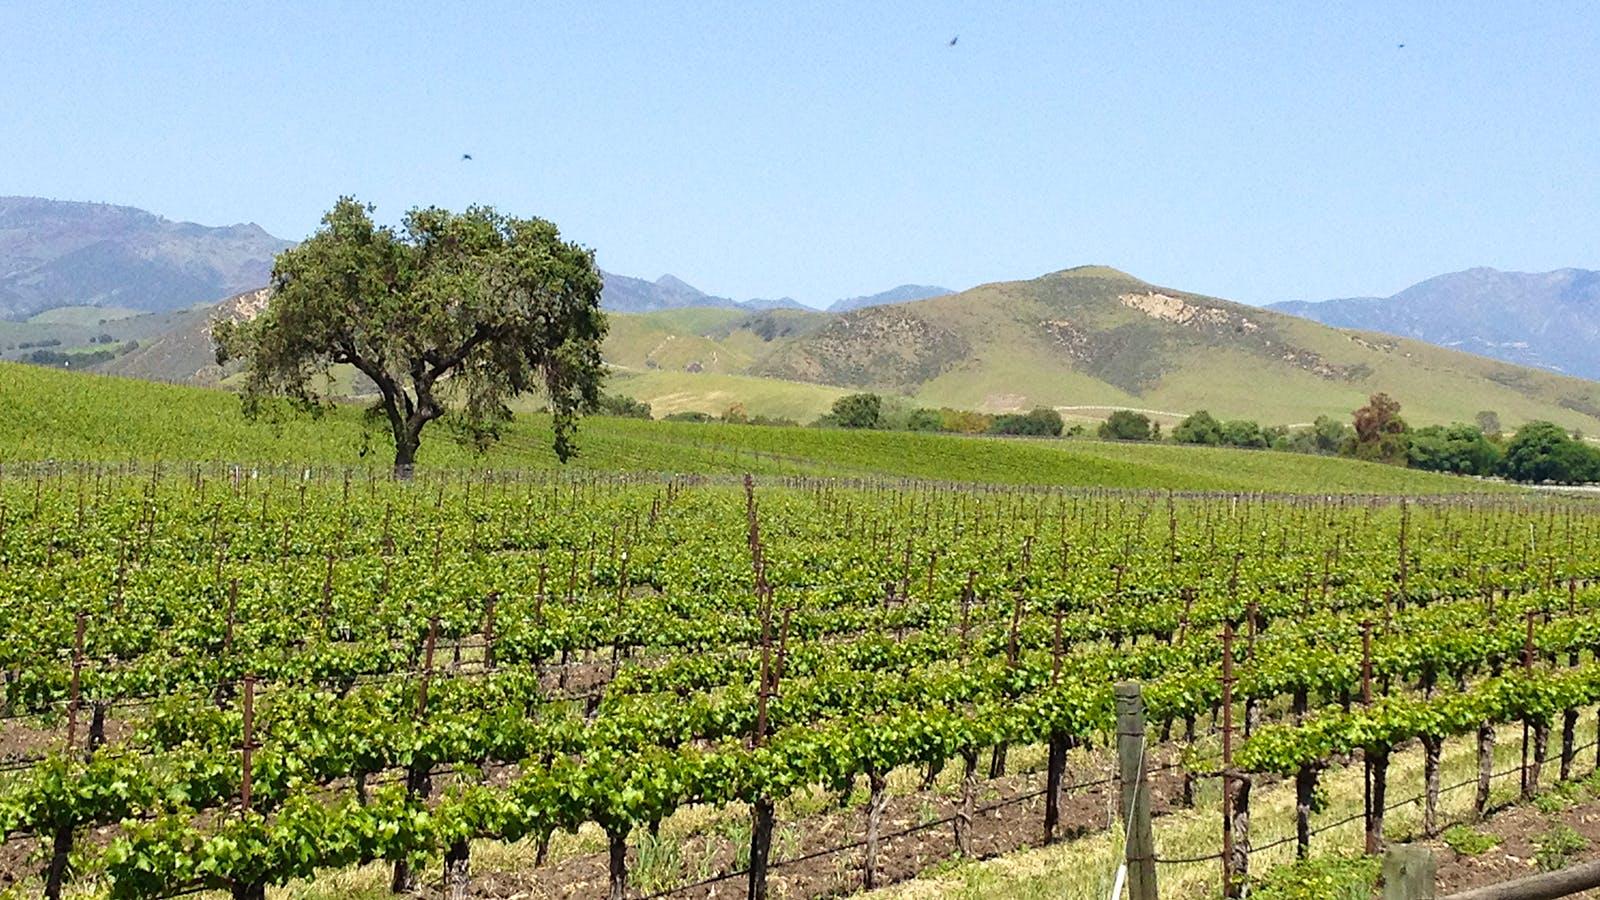 9 Juicy California Sauvignon Blancs